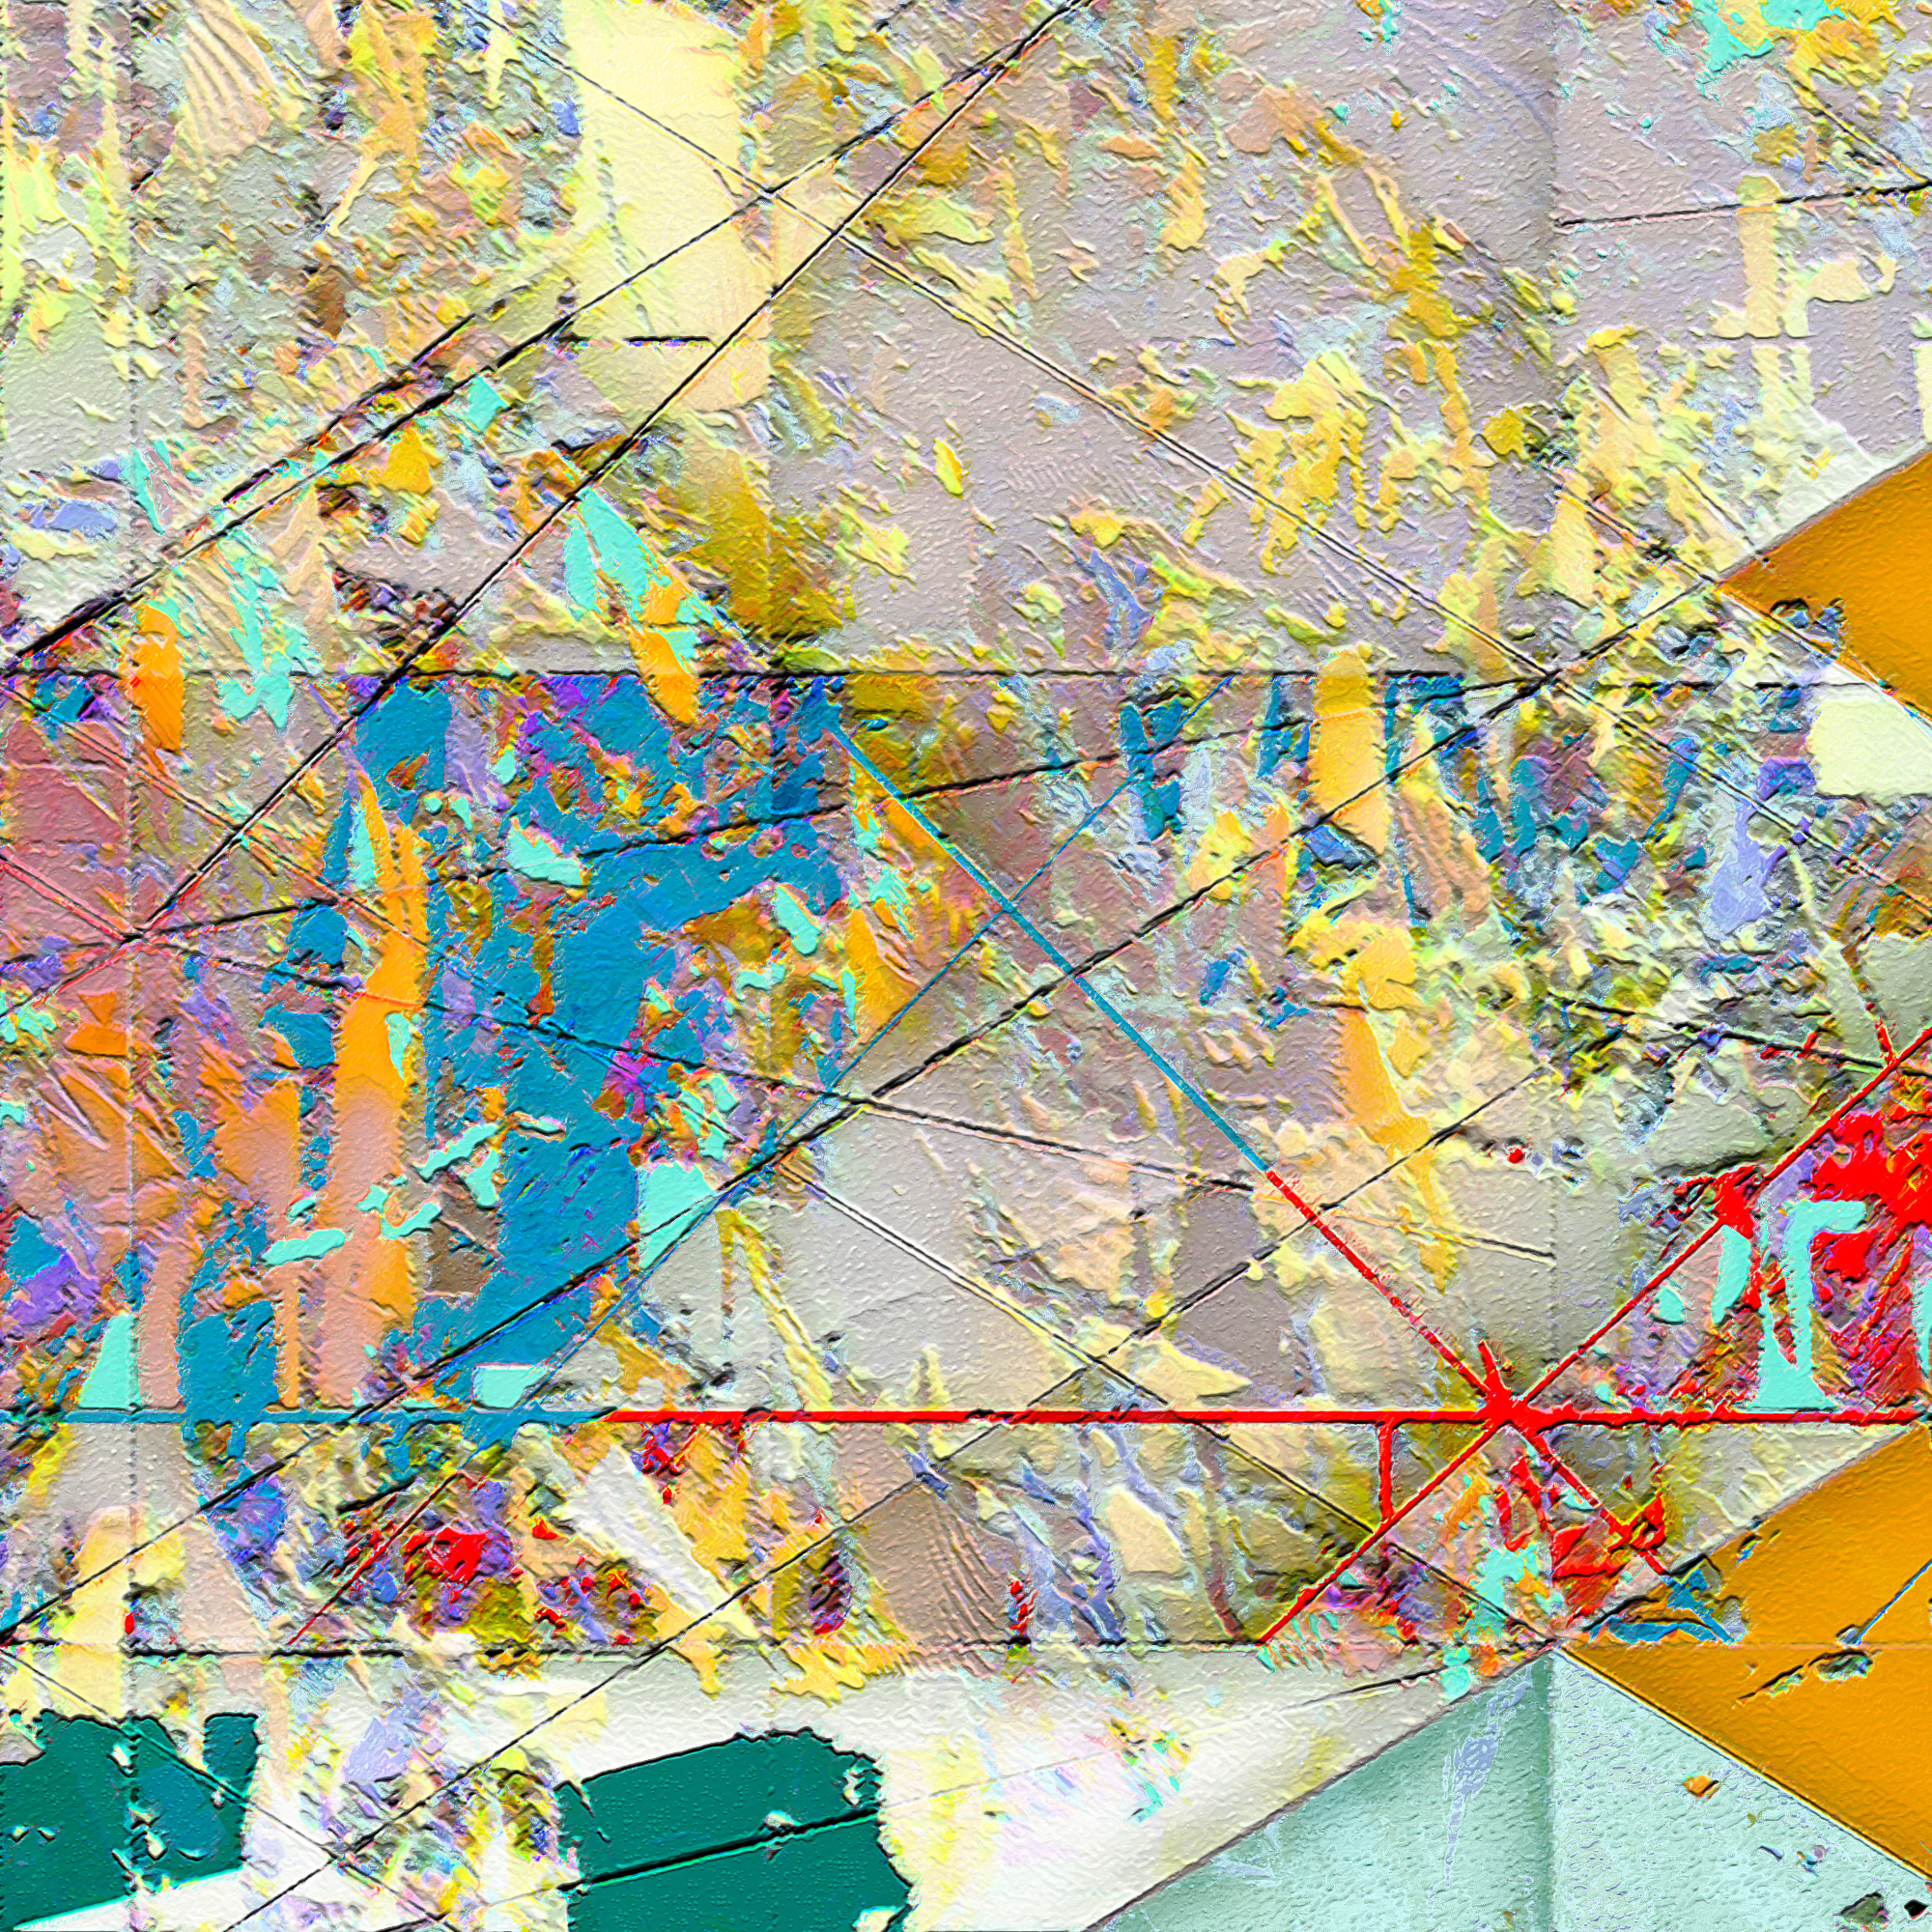 180805_Memory_Construction_Detail3.jpg